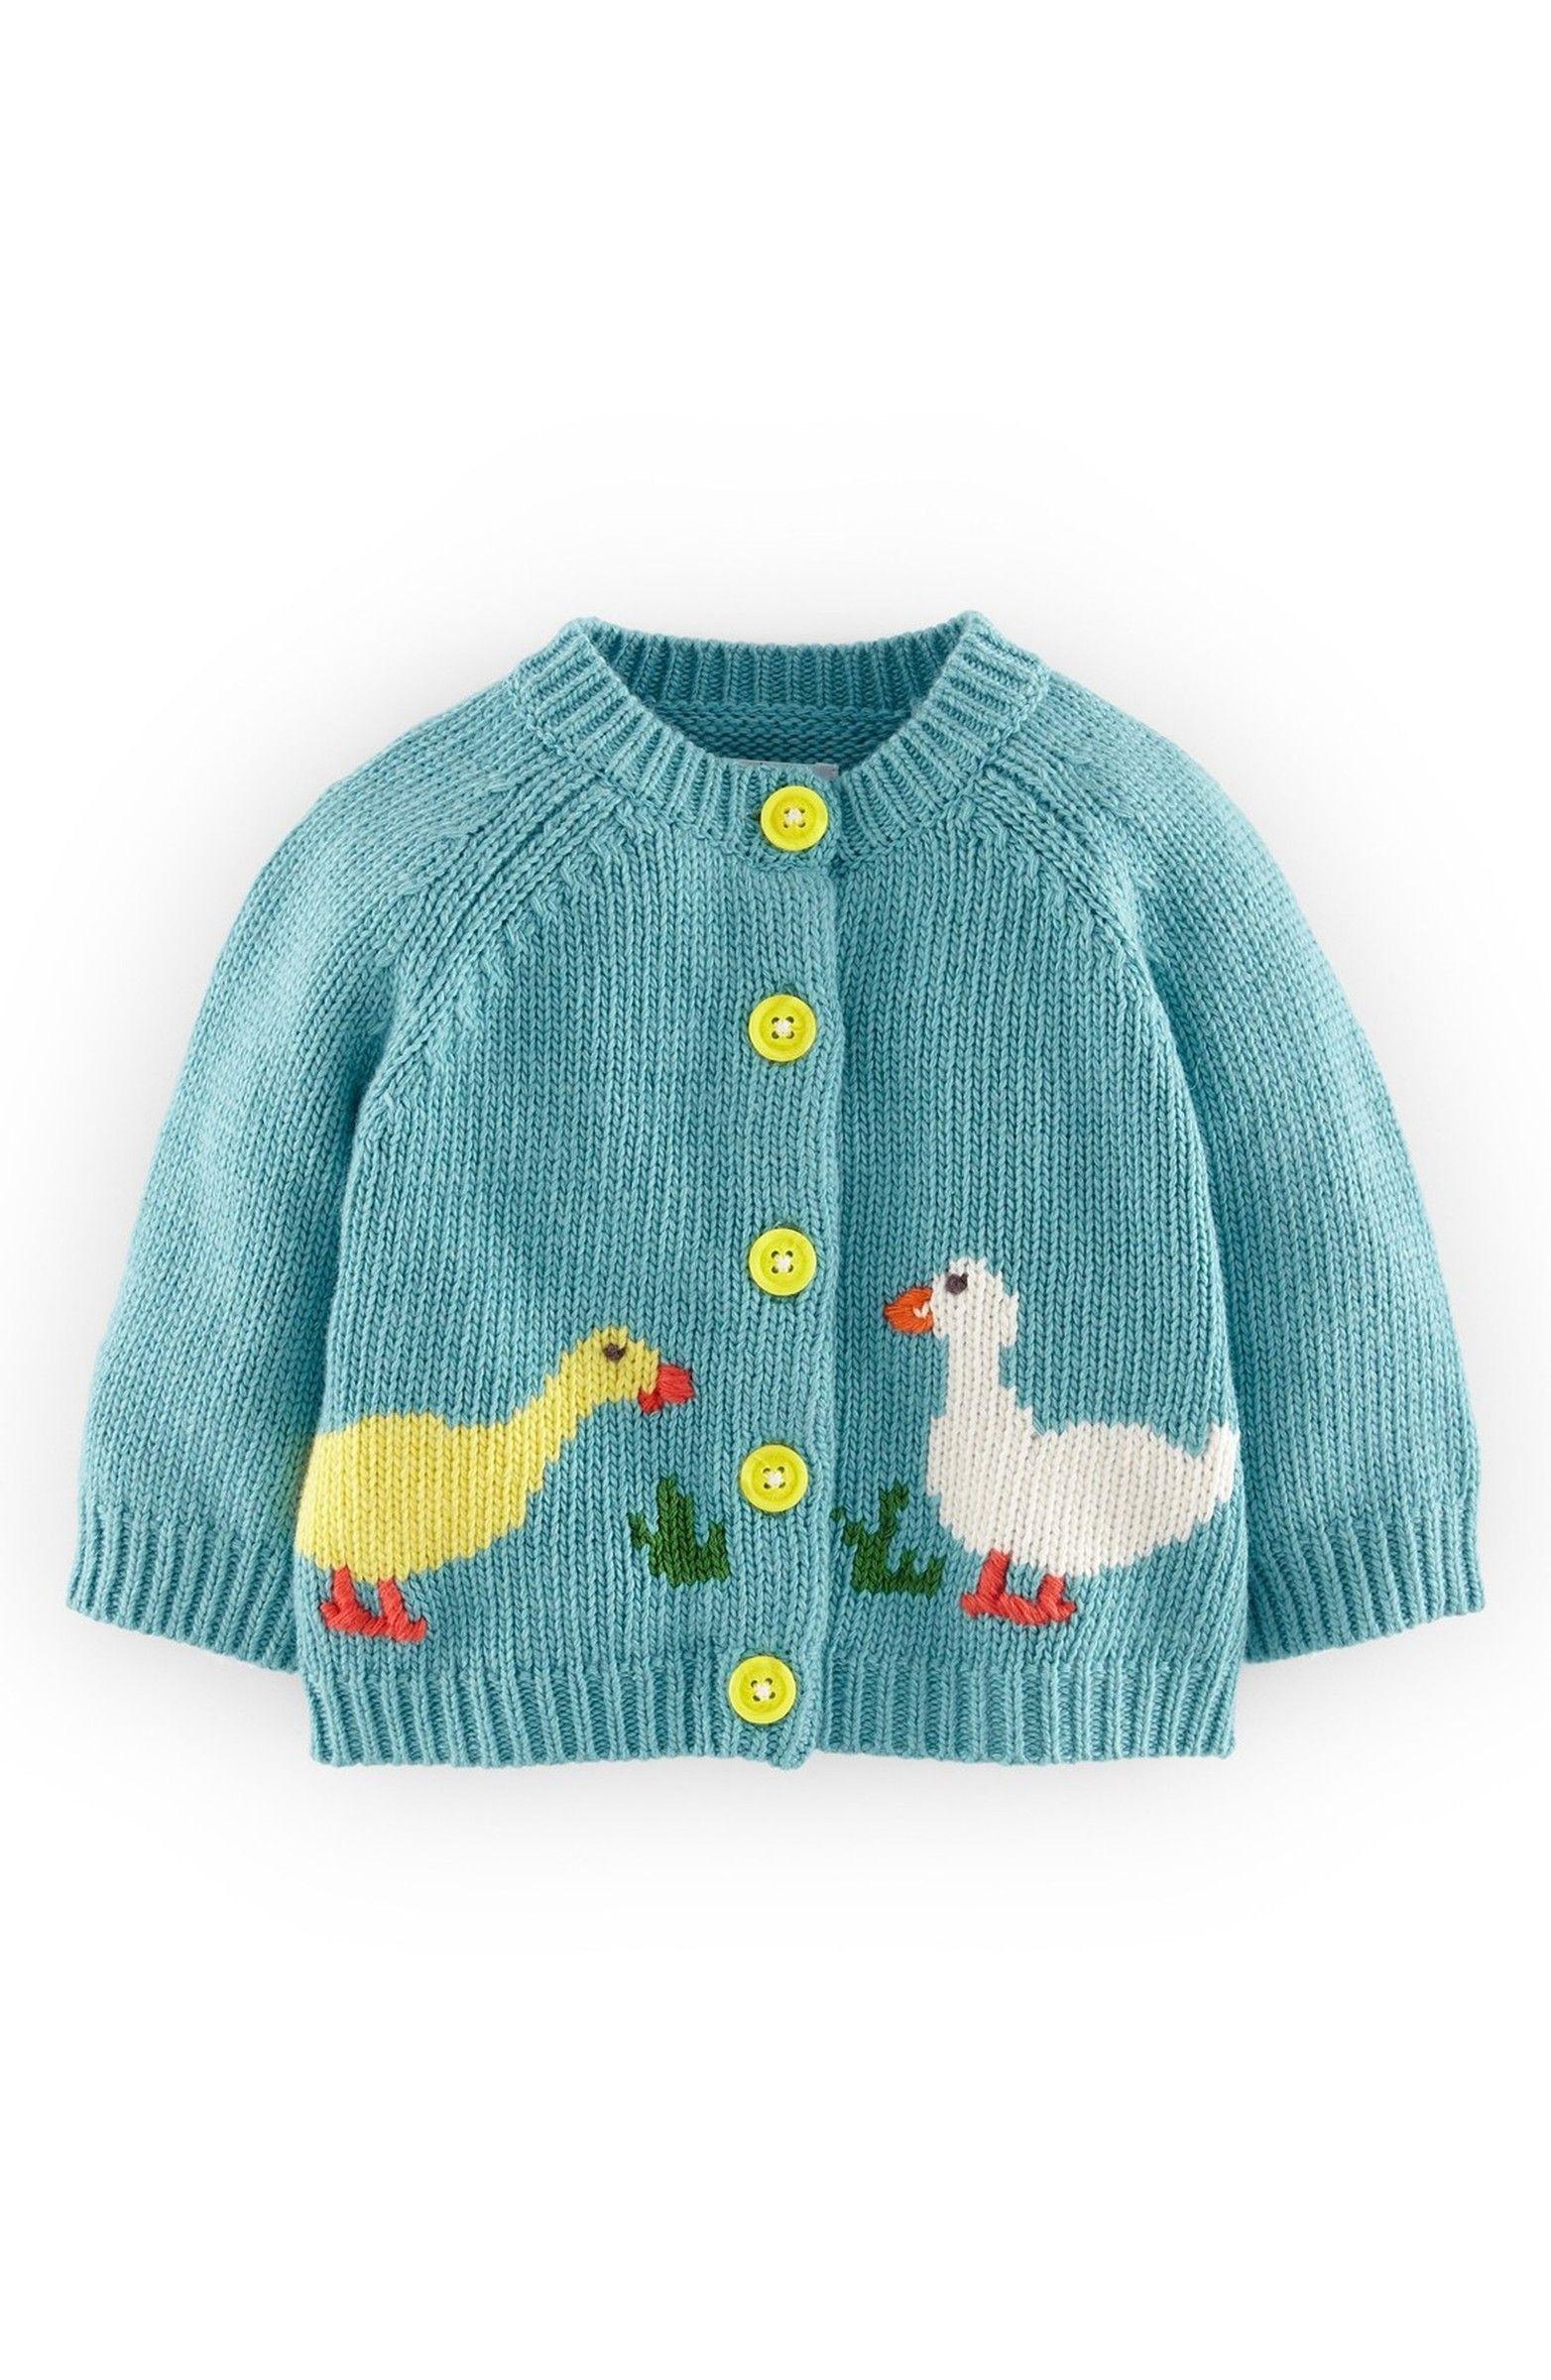 Main Image - Mini Boden \'My Favourite\' Intarsia Knit Cardigan (Baby ...